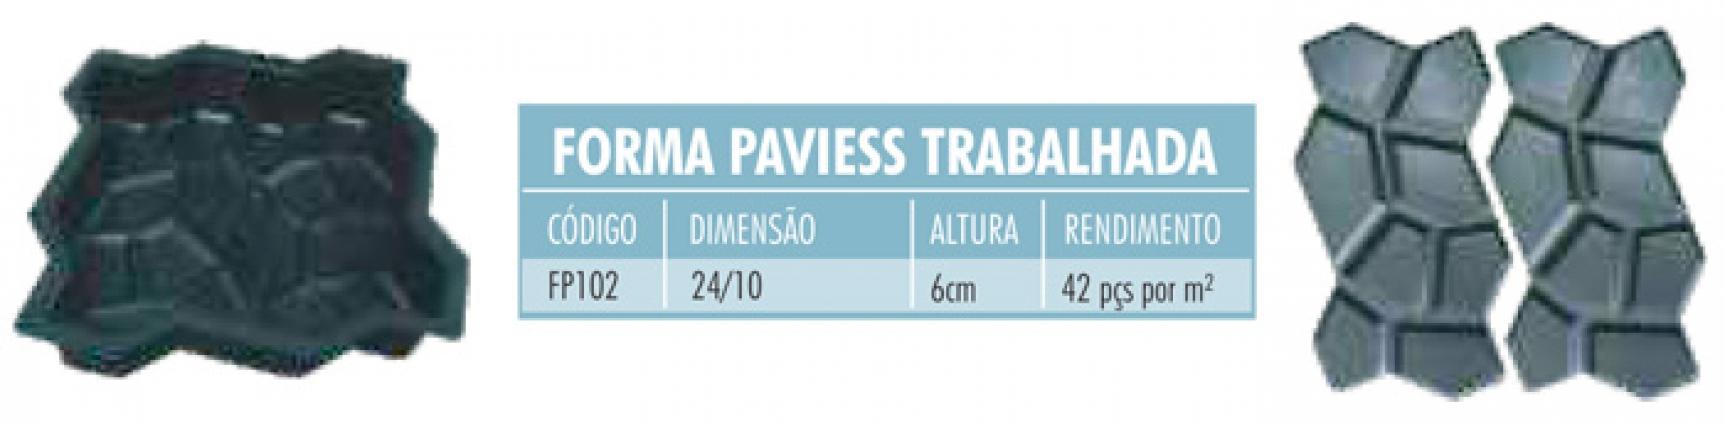 FormasPlasticas-20150313115843.jpg